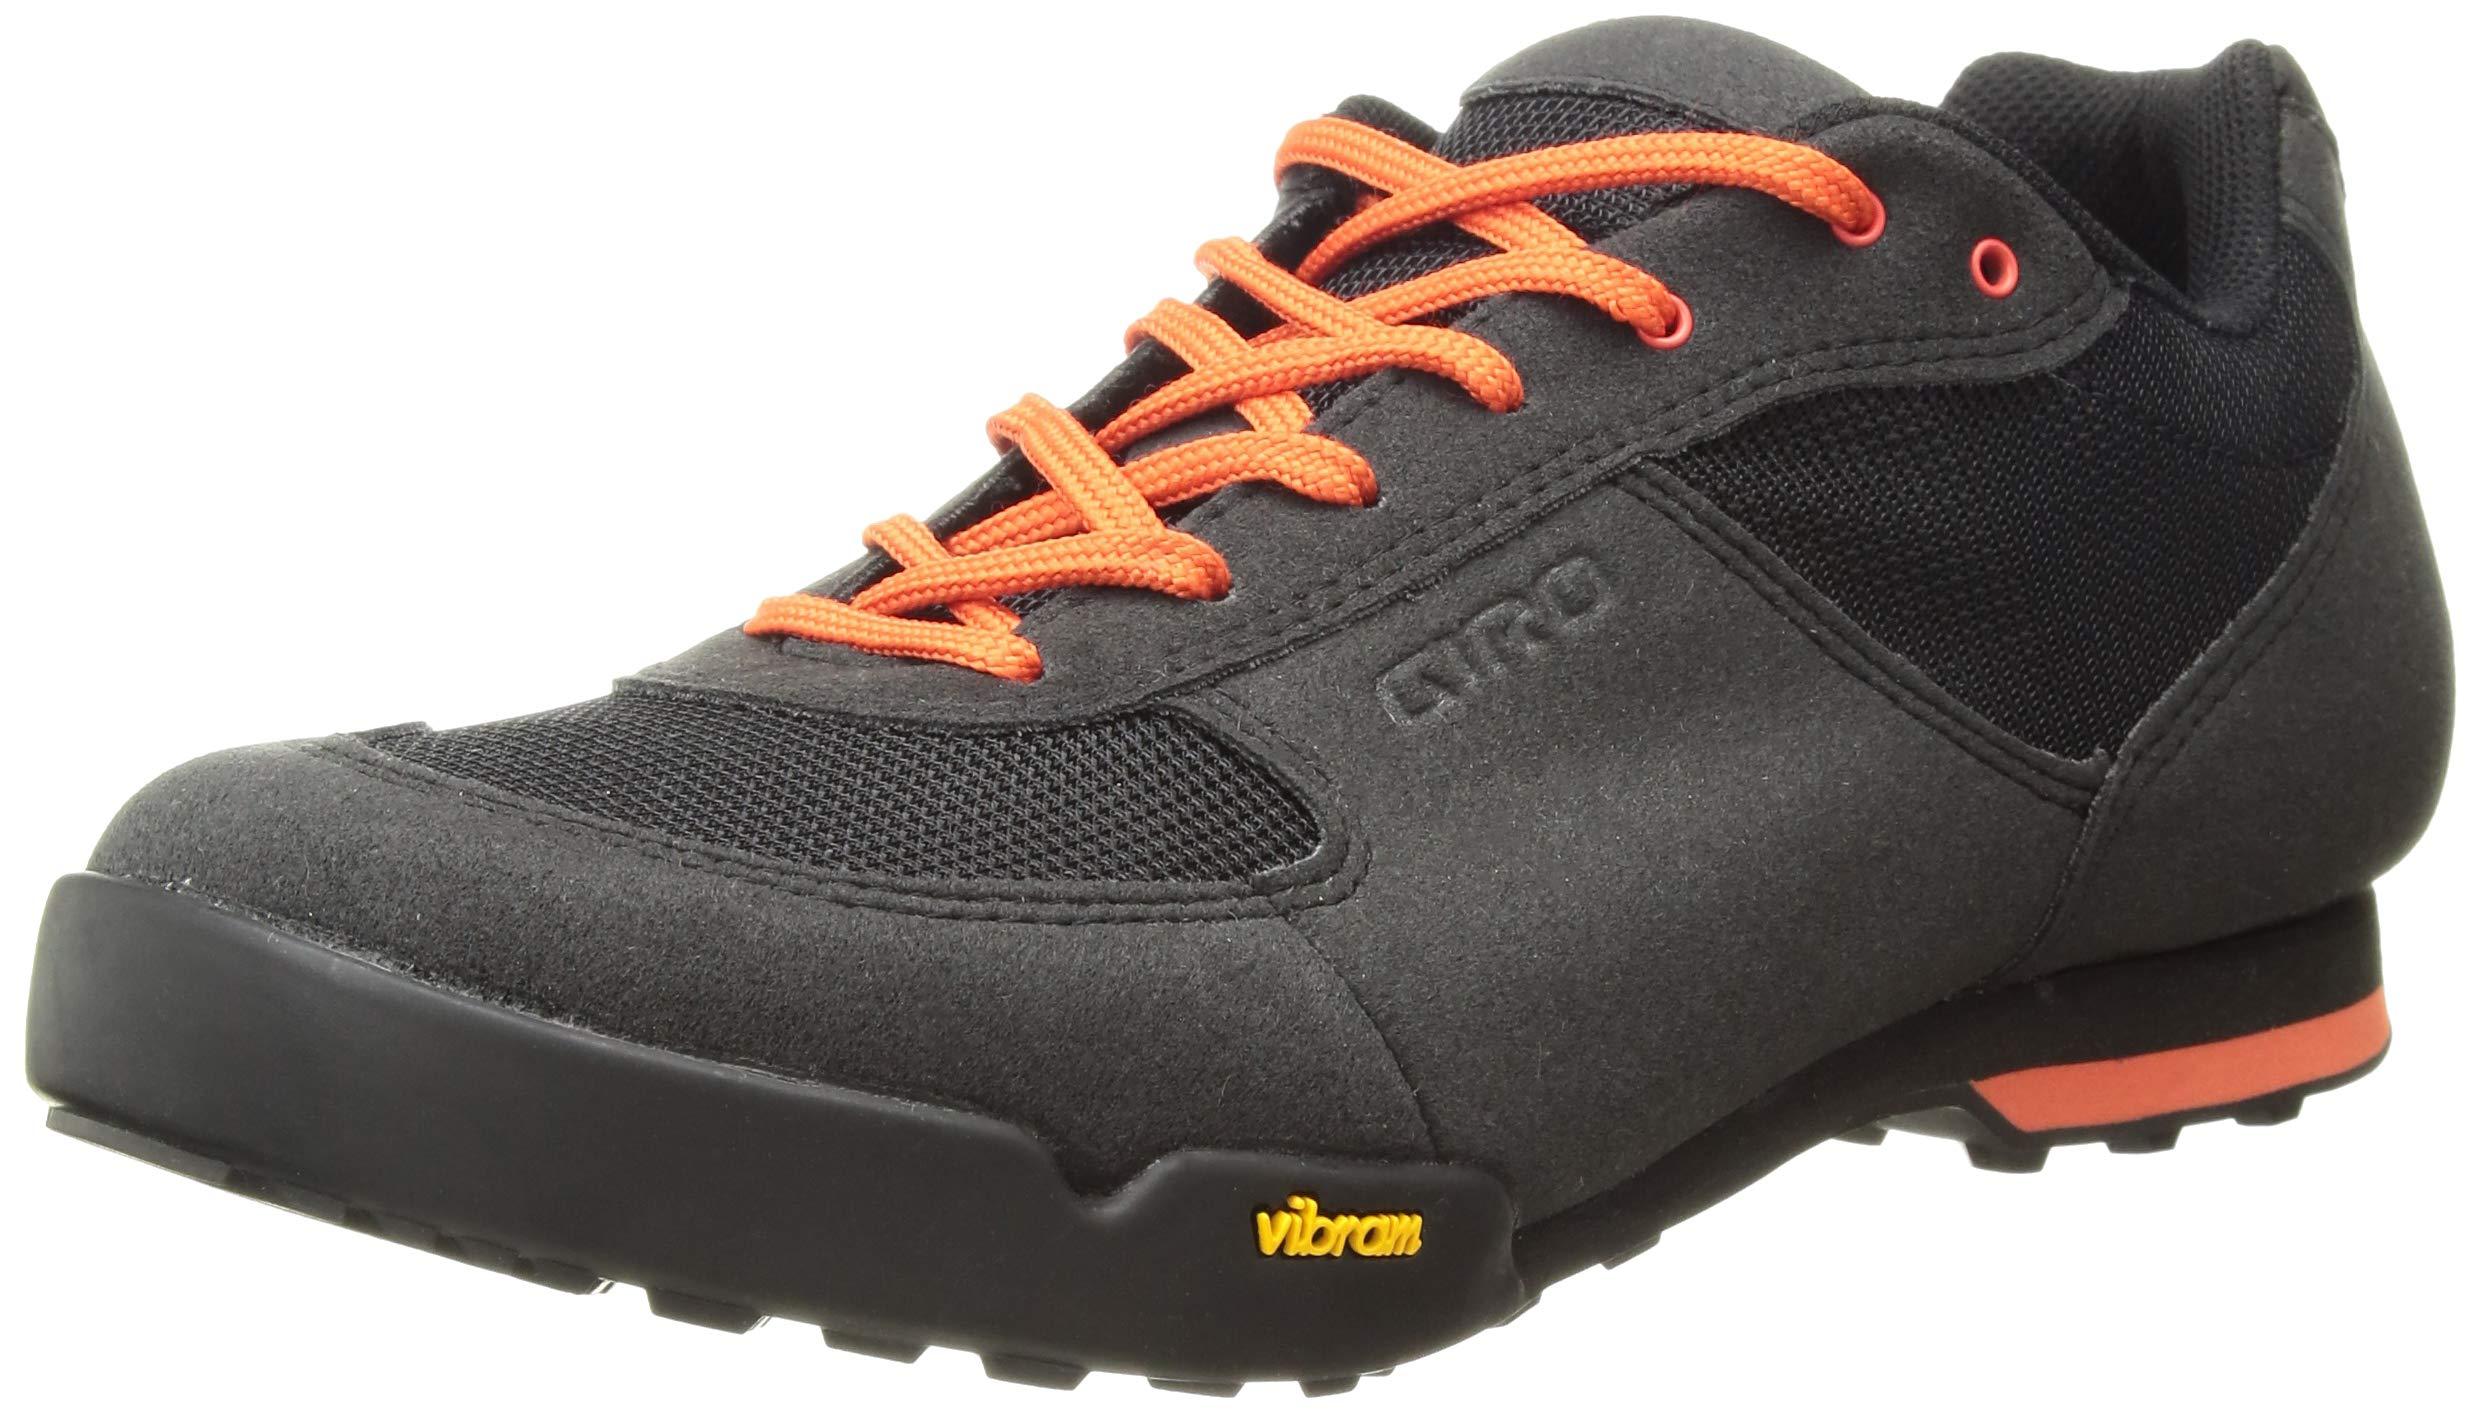 Giro Rumble Vr MTB Shoes Black/Glowing Red 42